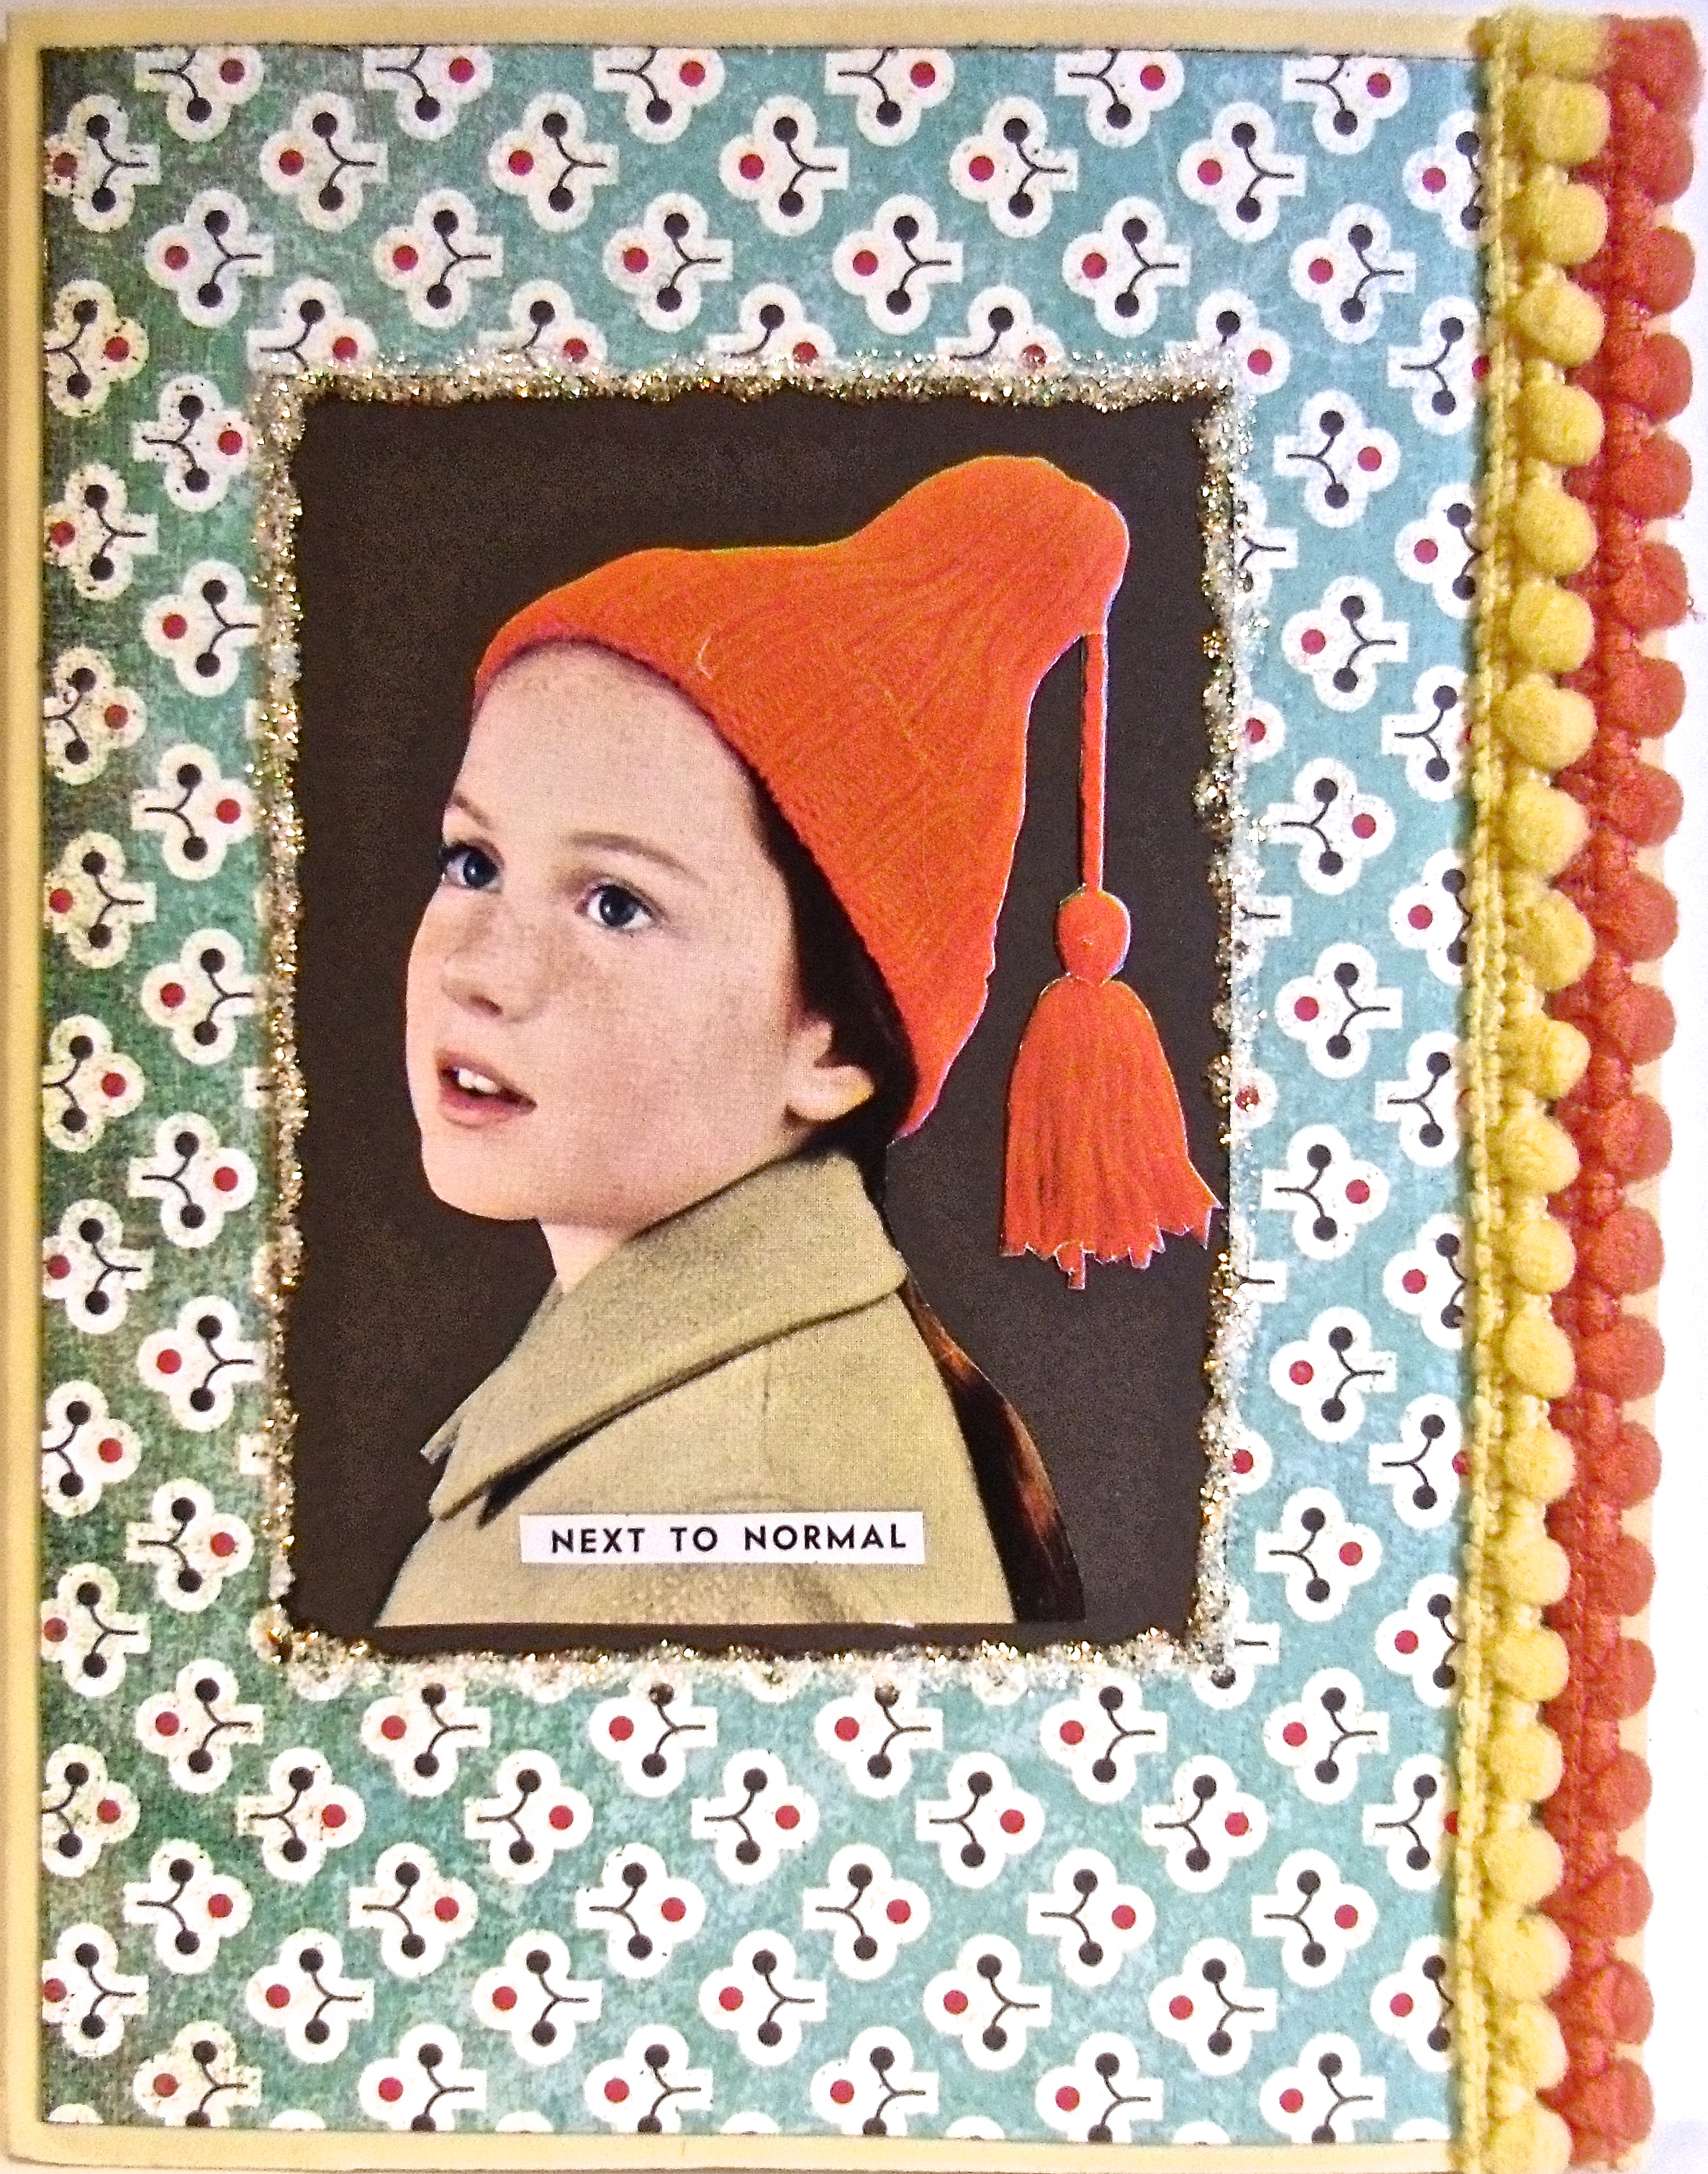 handmade greeting cards, collage art,